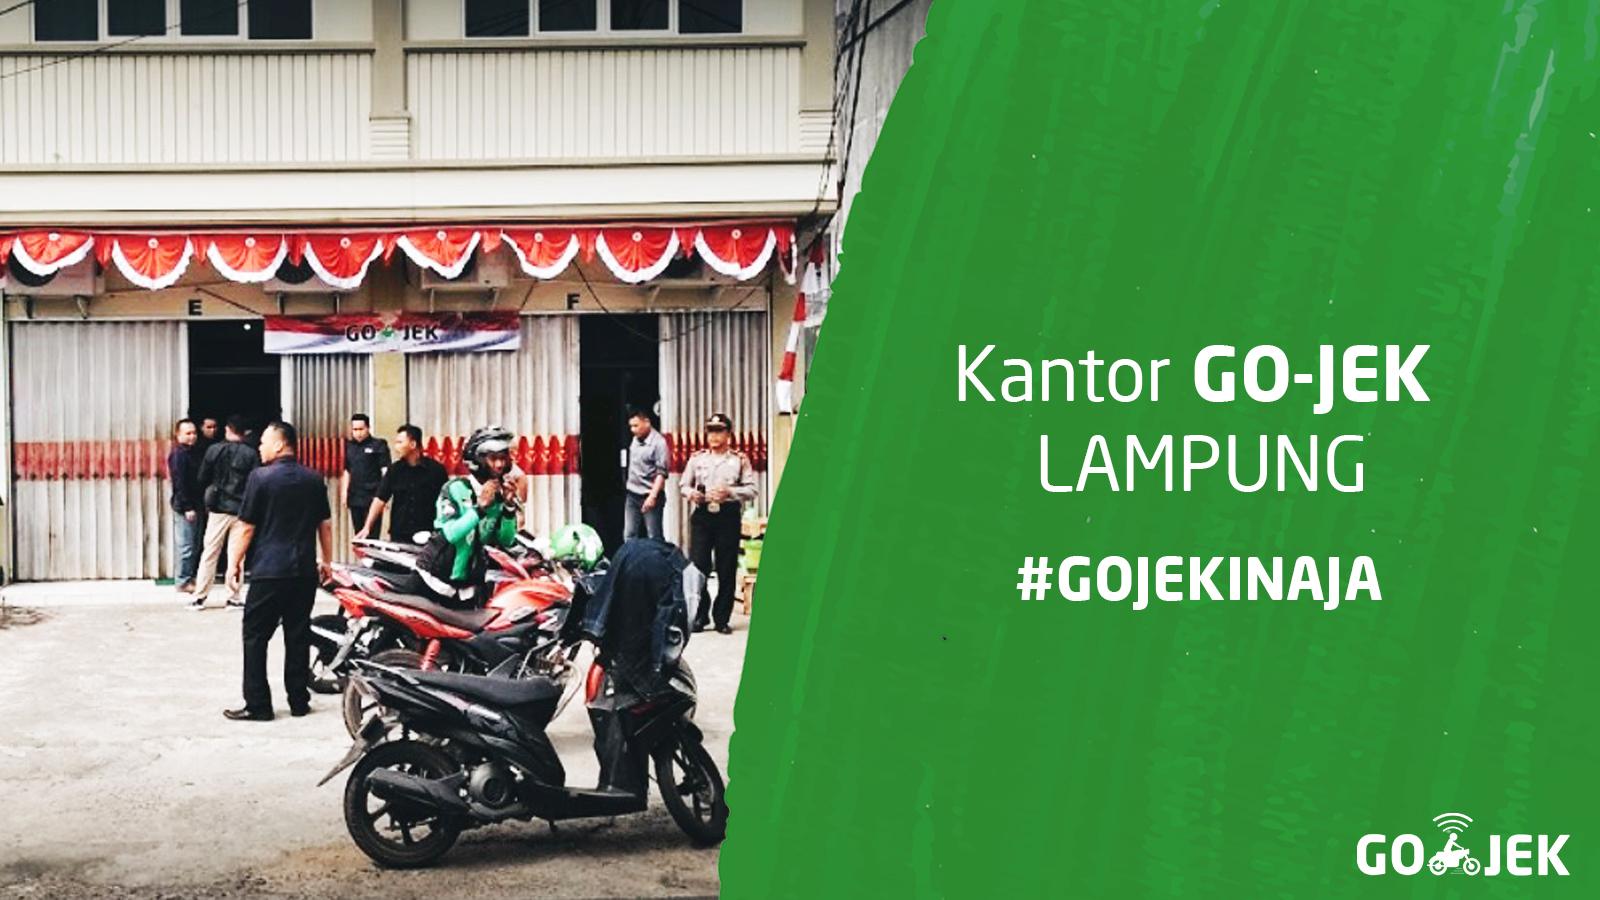 GO-JEK Lampung